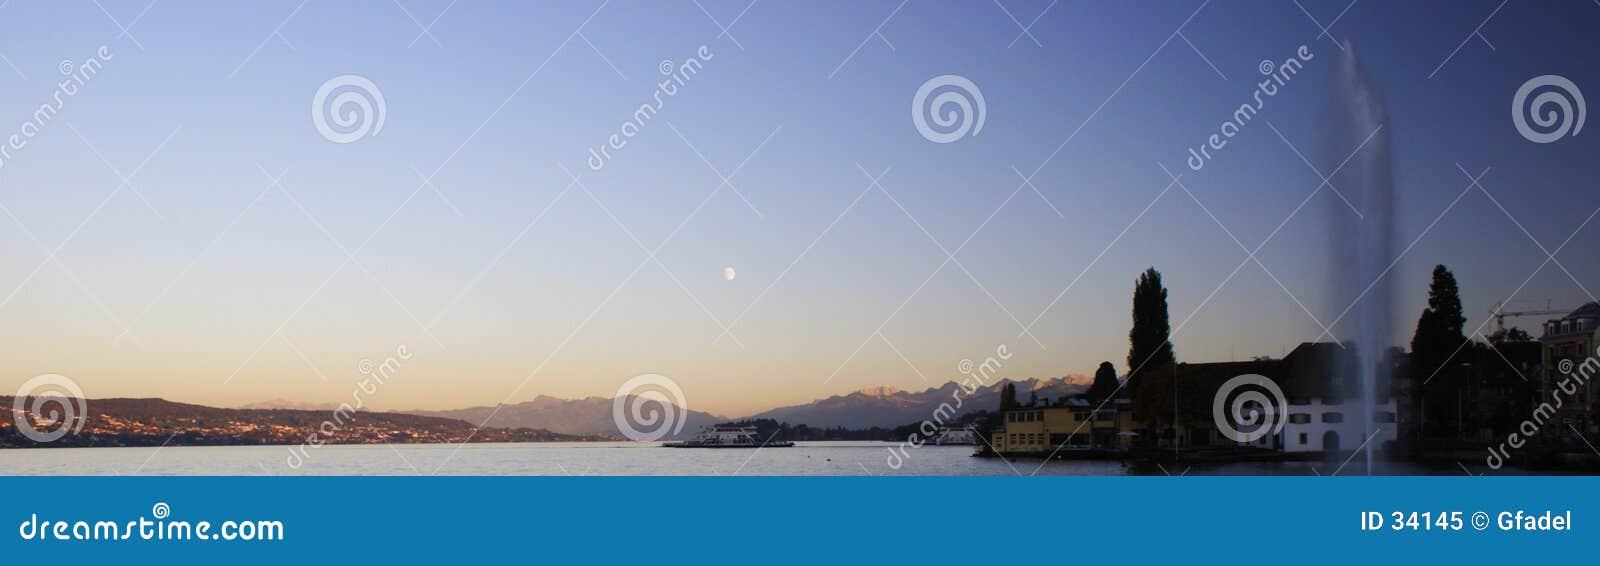 Coucher du soleil - panorama